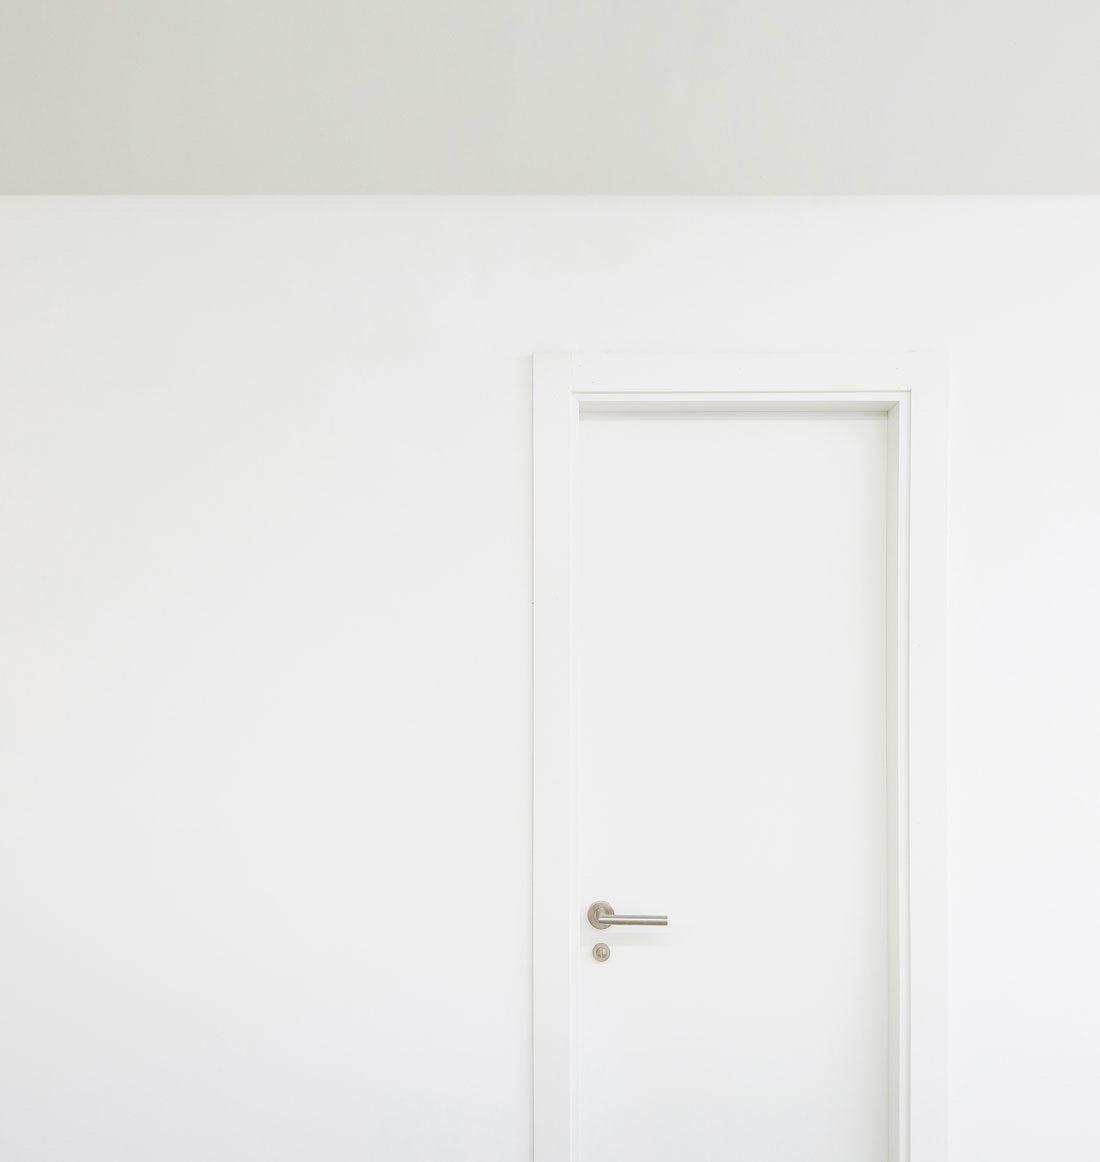 estudio apolo. puerta minimalista